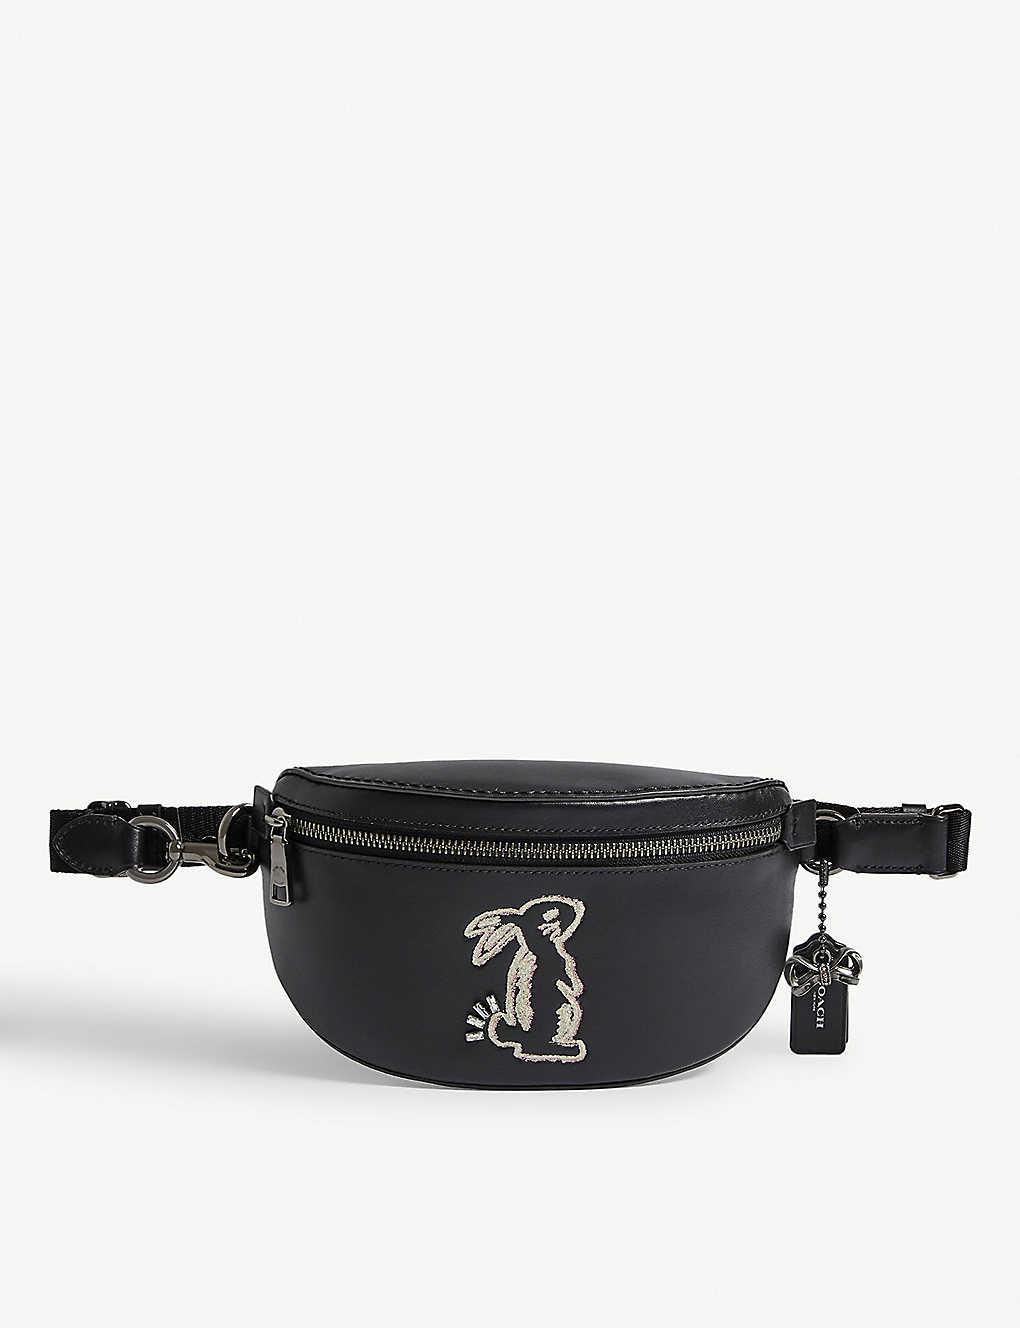 d83b0708bf19 COACH - Selena x Coach belt bag